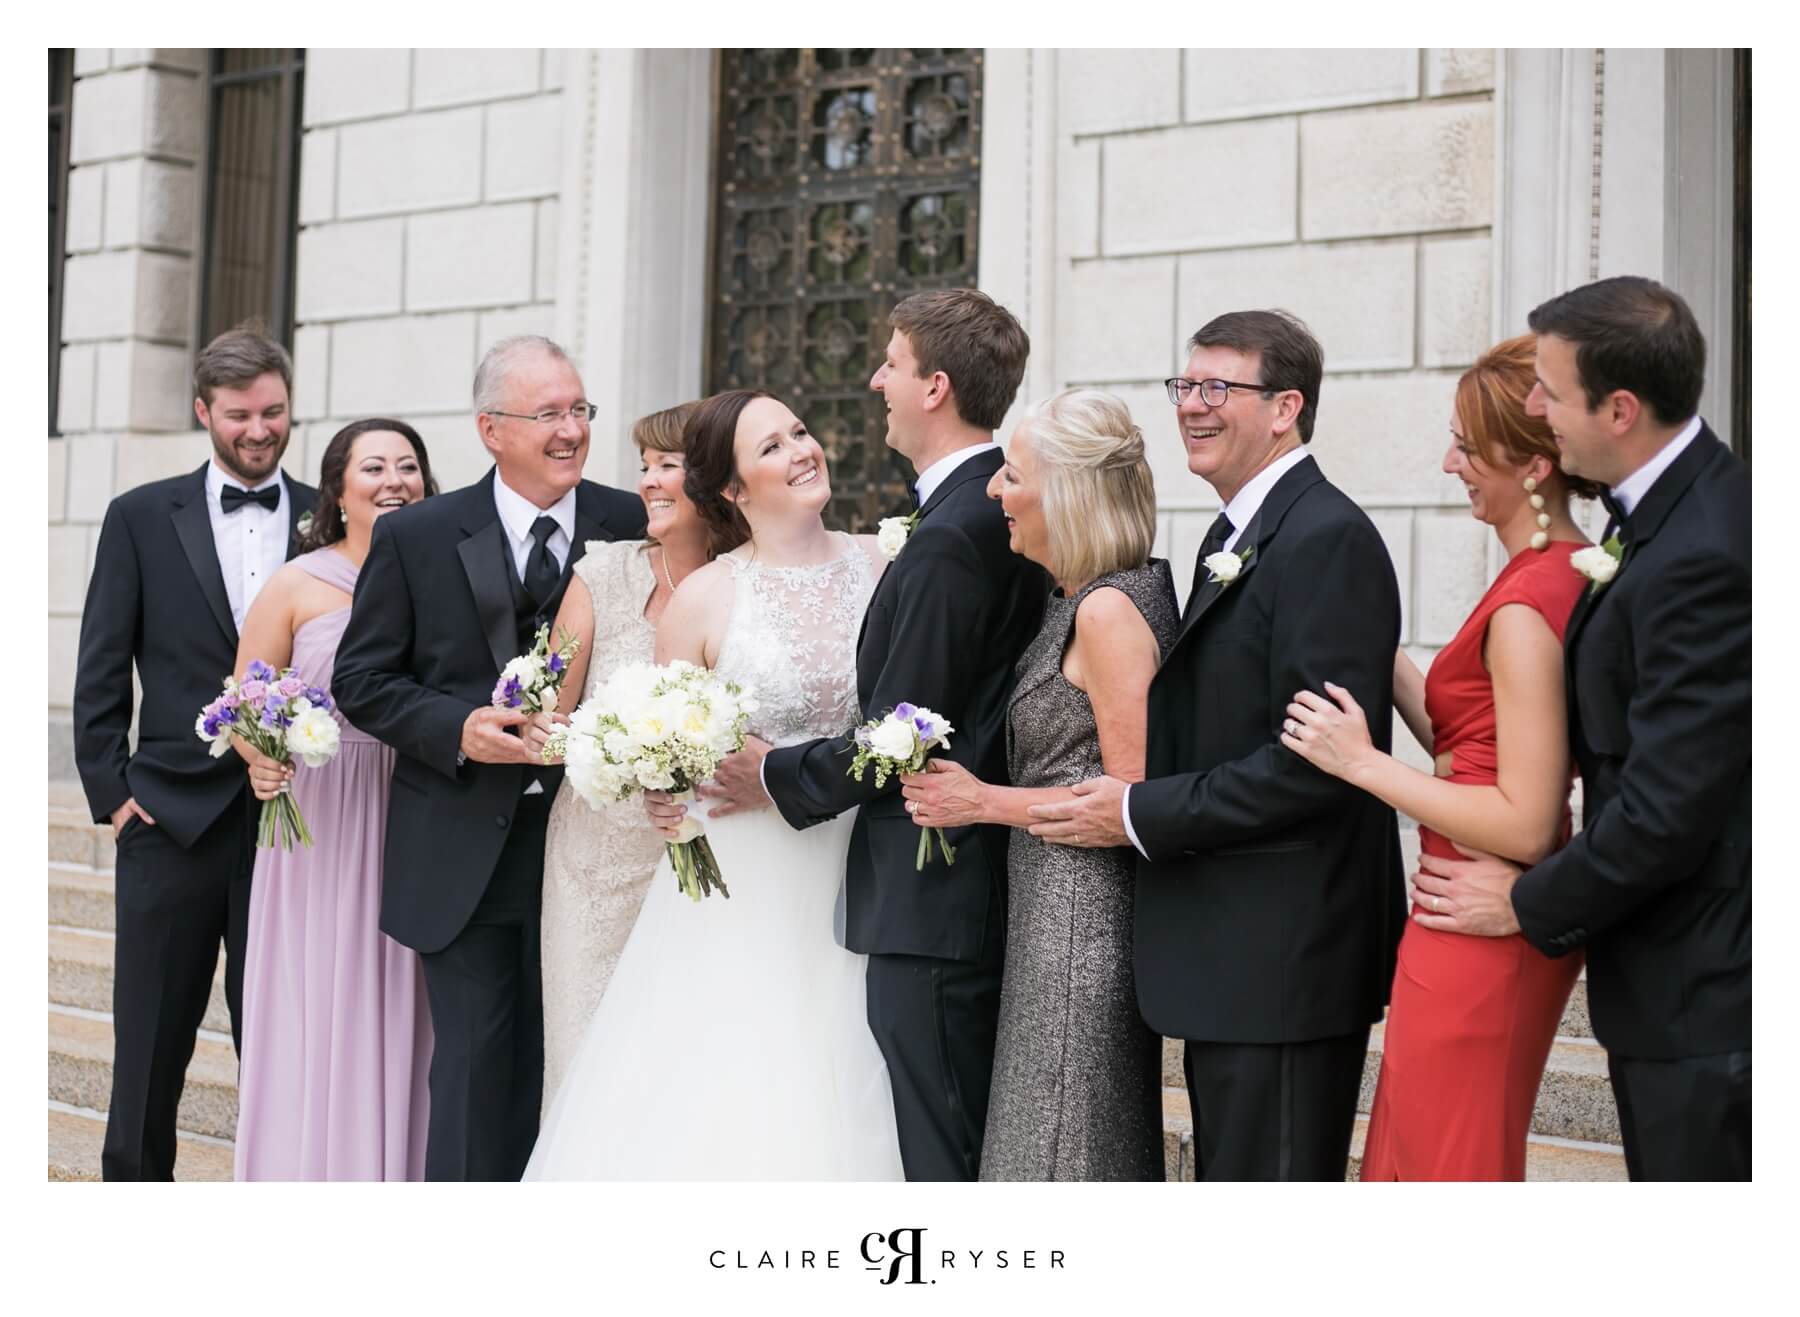 Claire and David Wedding Blog 15.jpg